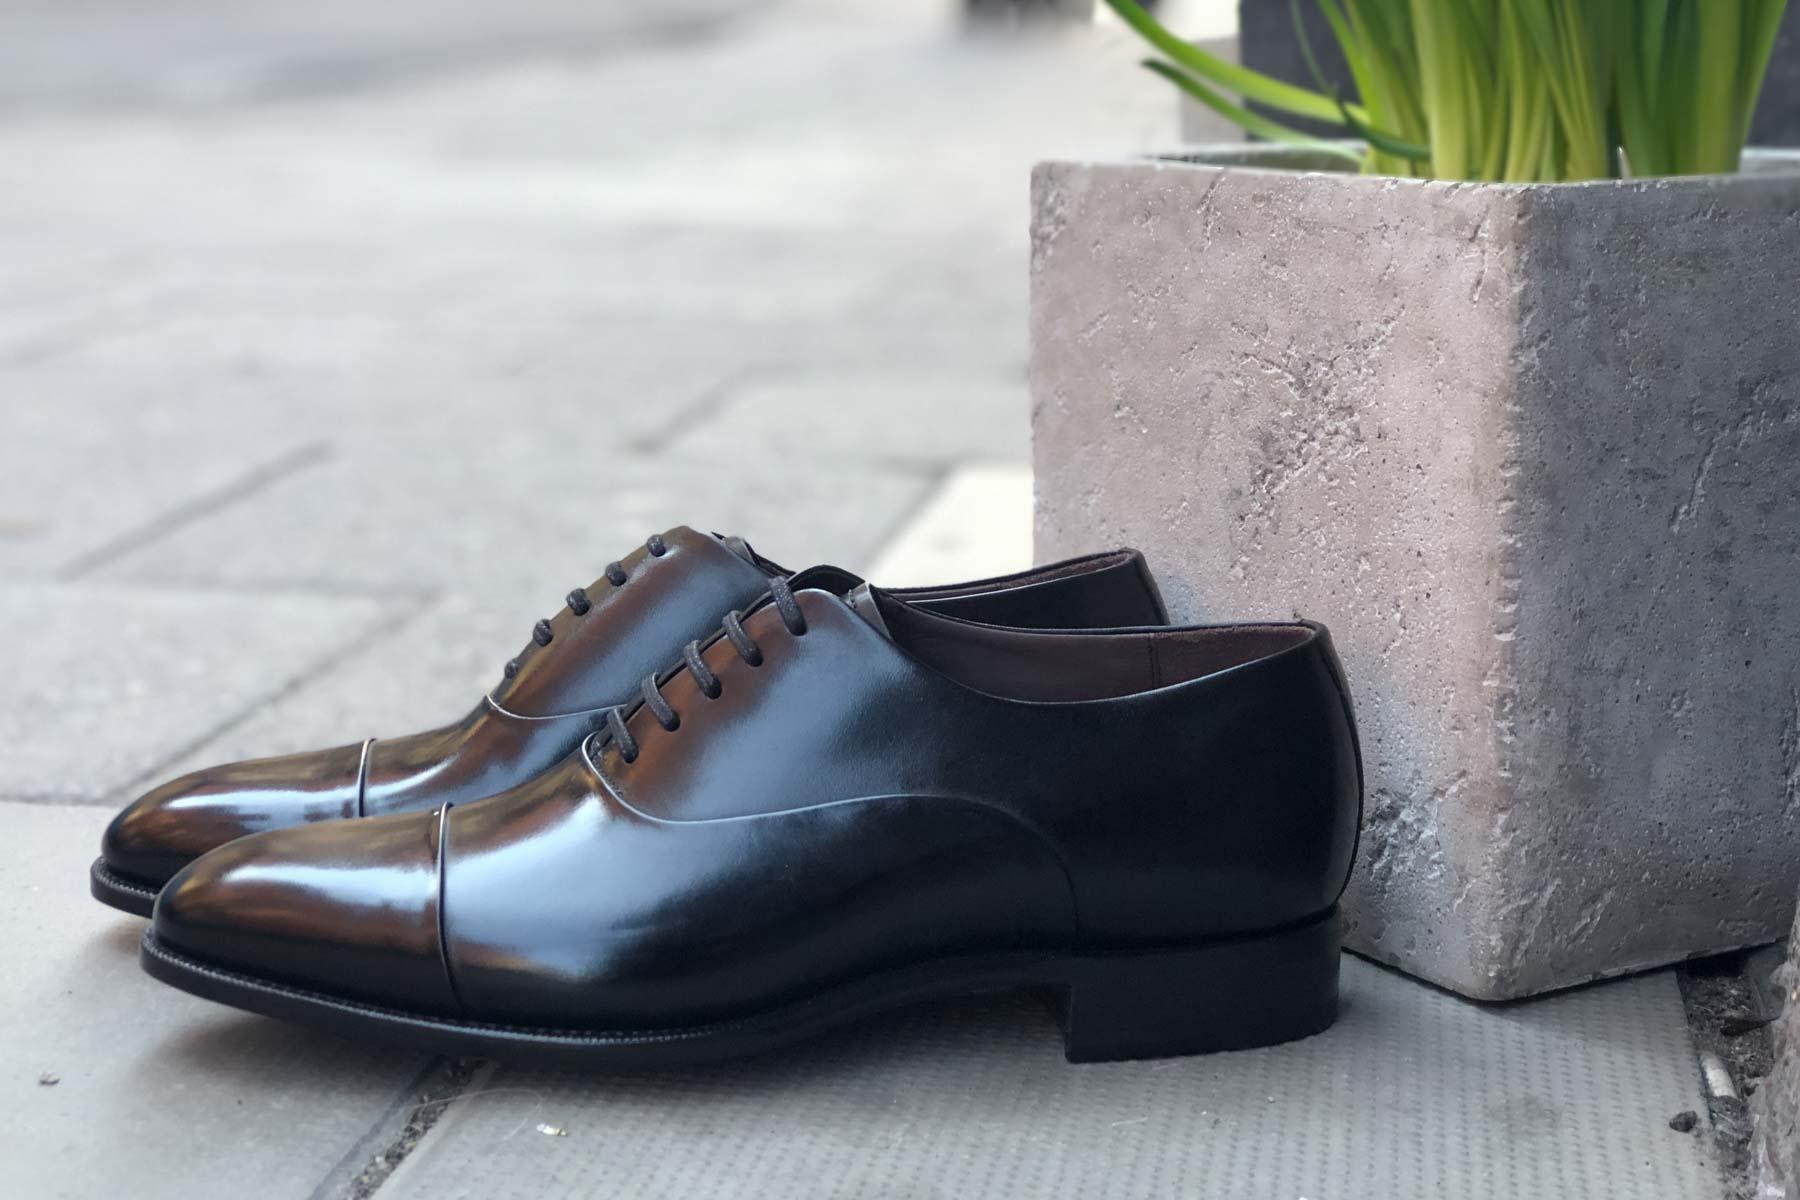 Carlos Santos 9899 Handgrade Oxford in Black Calf for The Noble Shoe Side